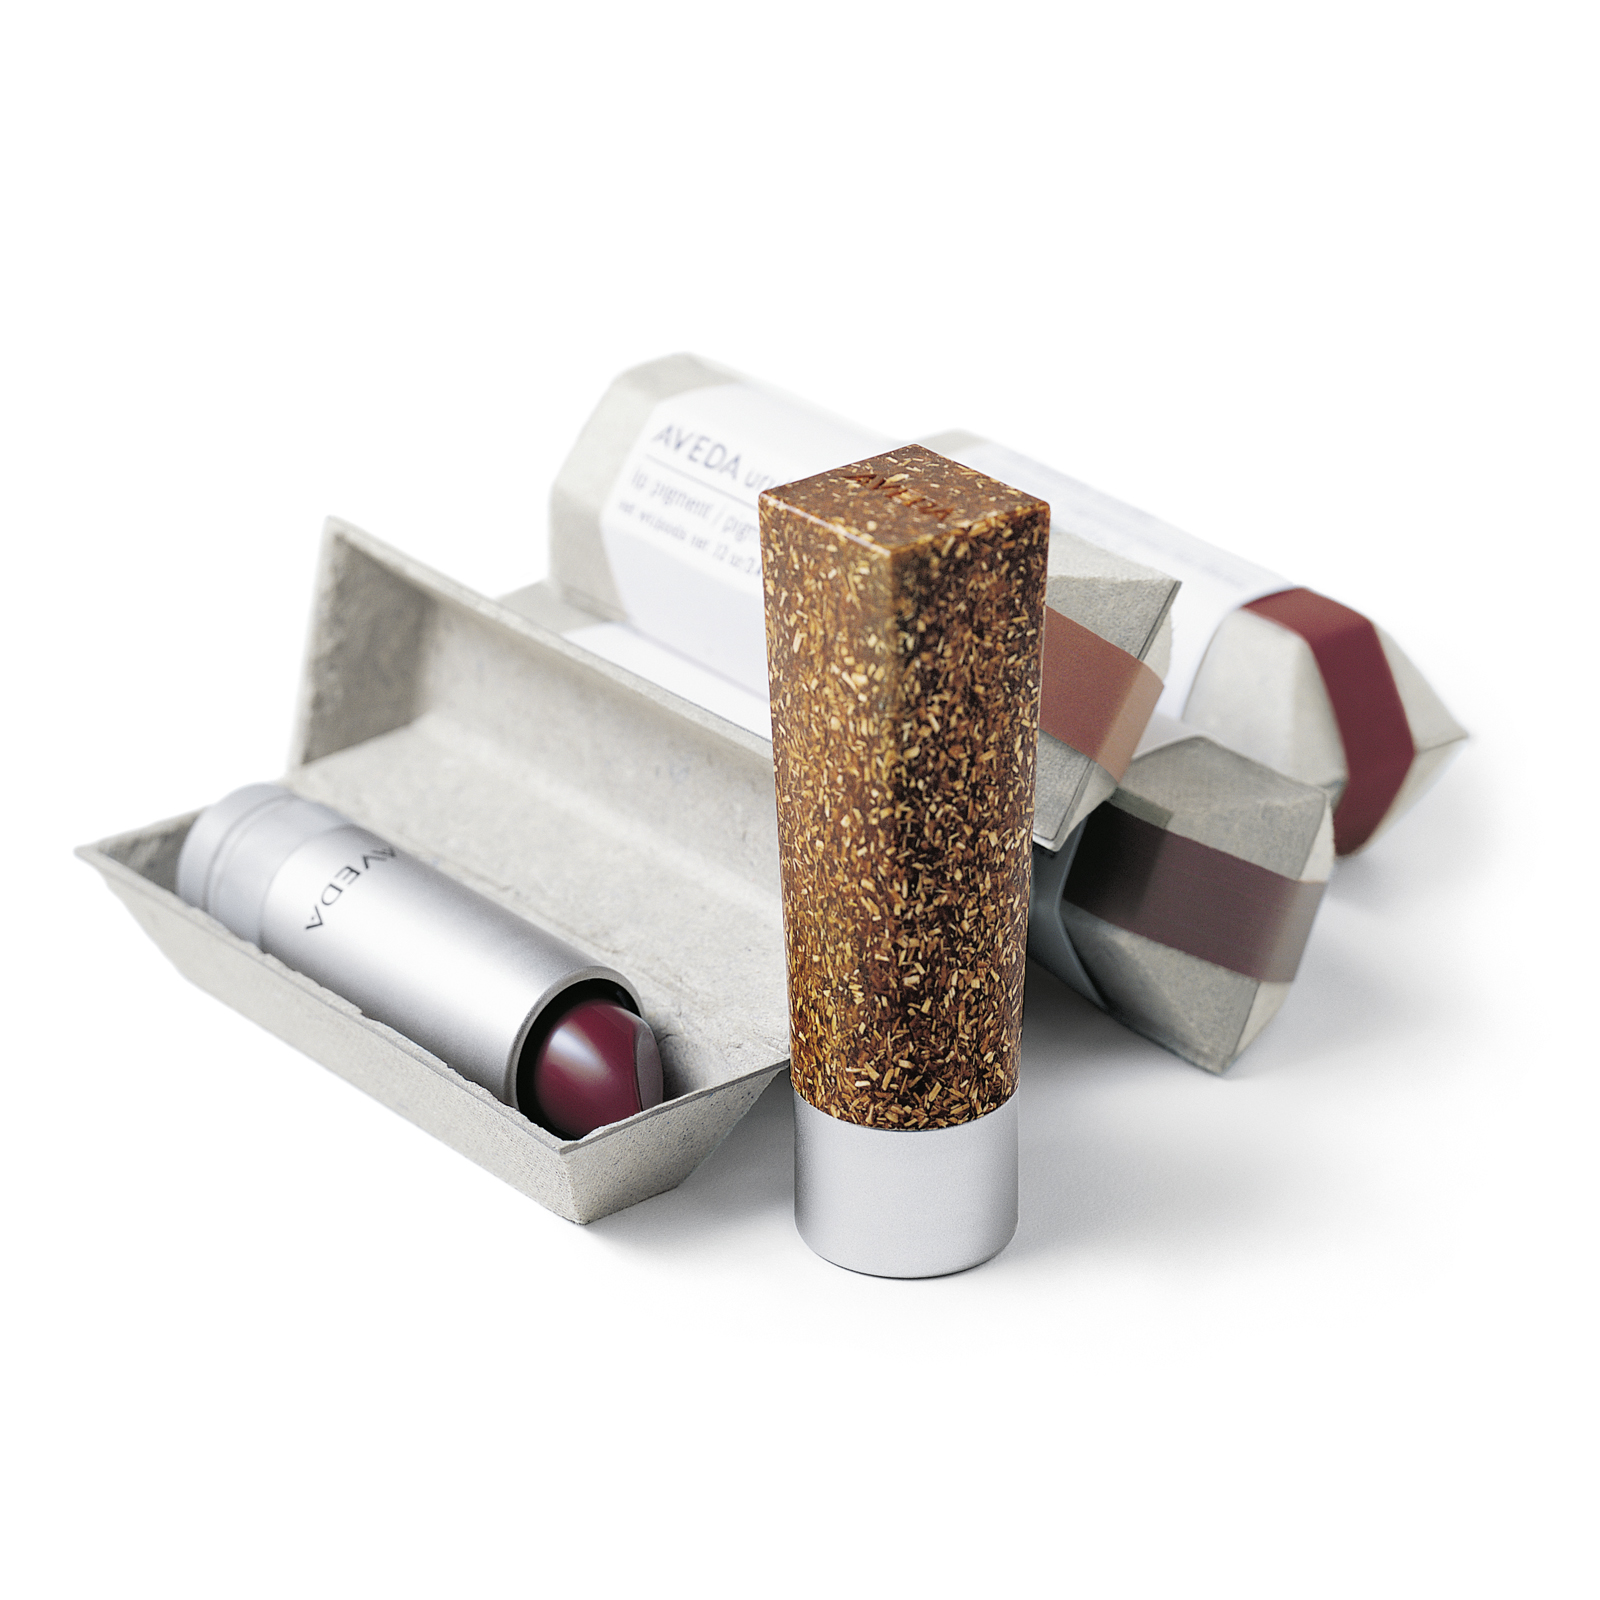 Uruku makeup packaging